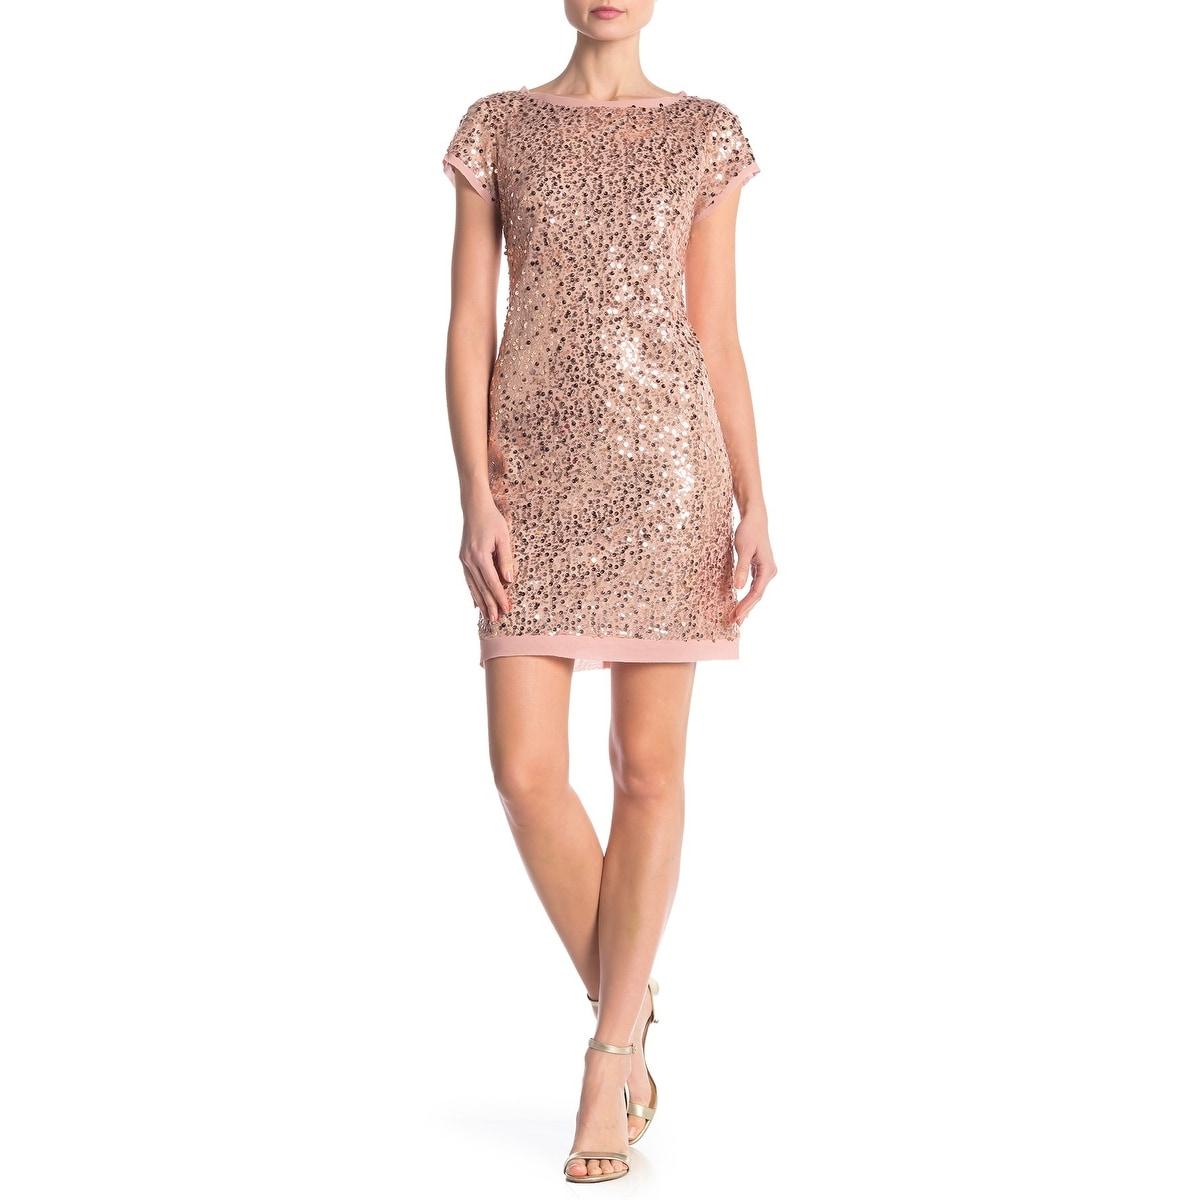 8a7cc3f7450 Pink Vince Camuto Dresses